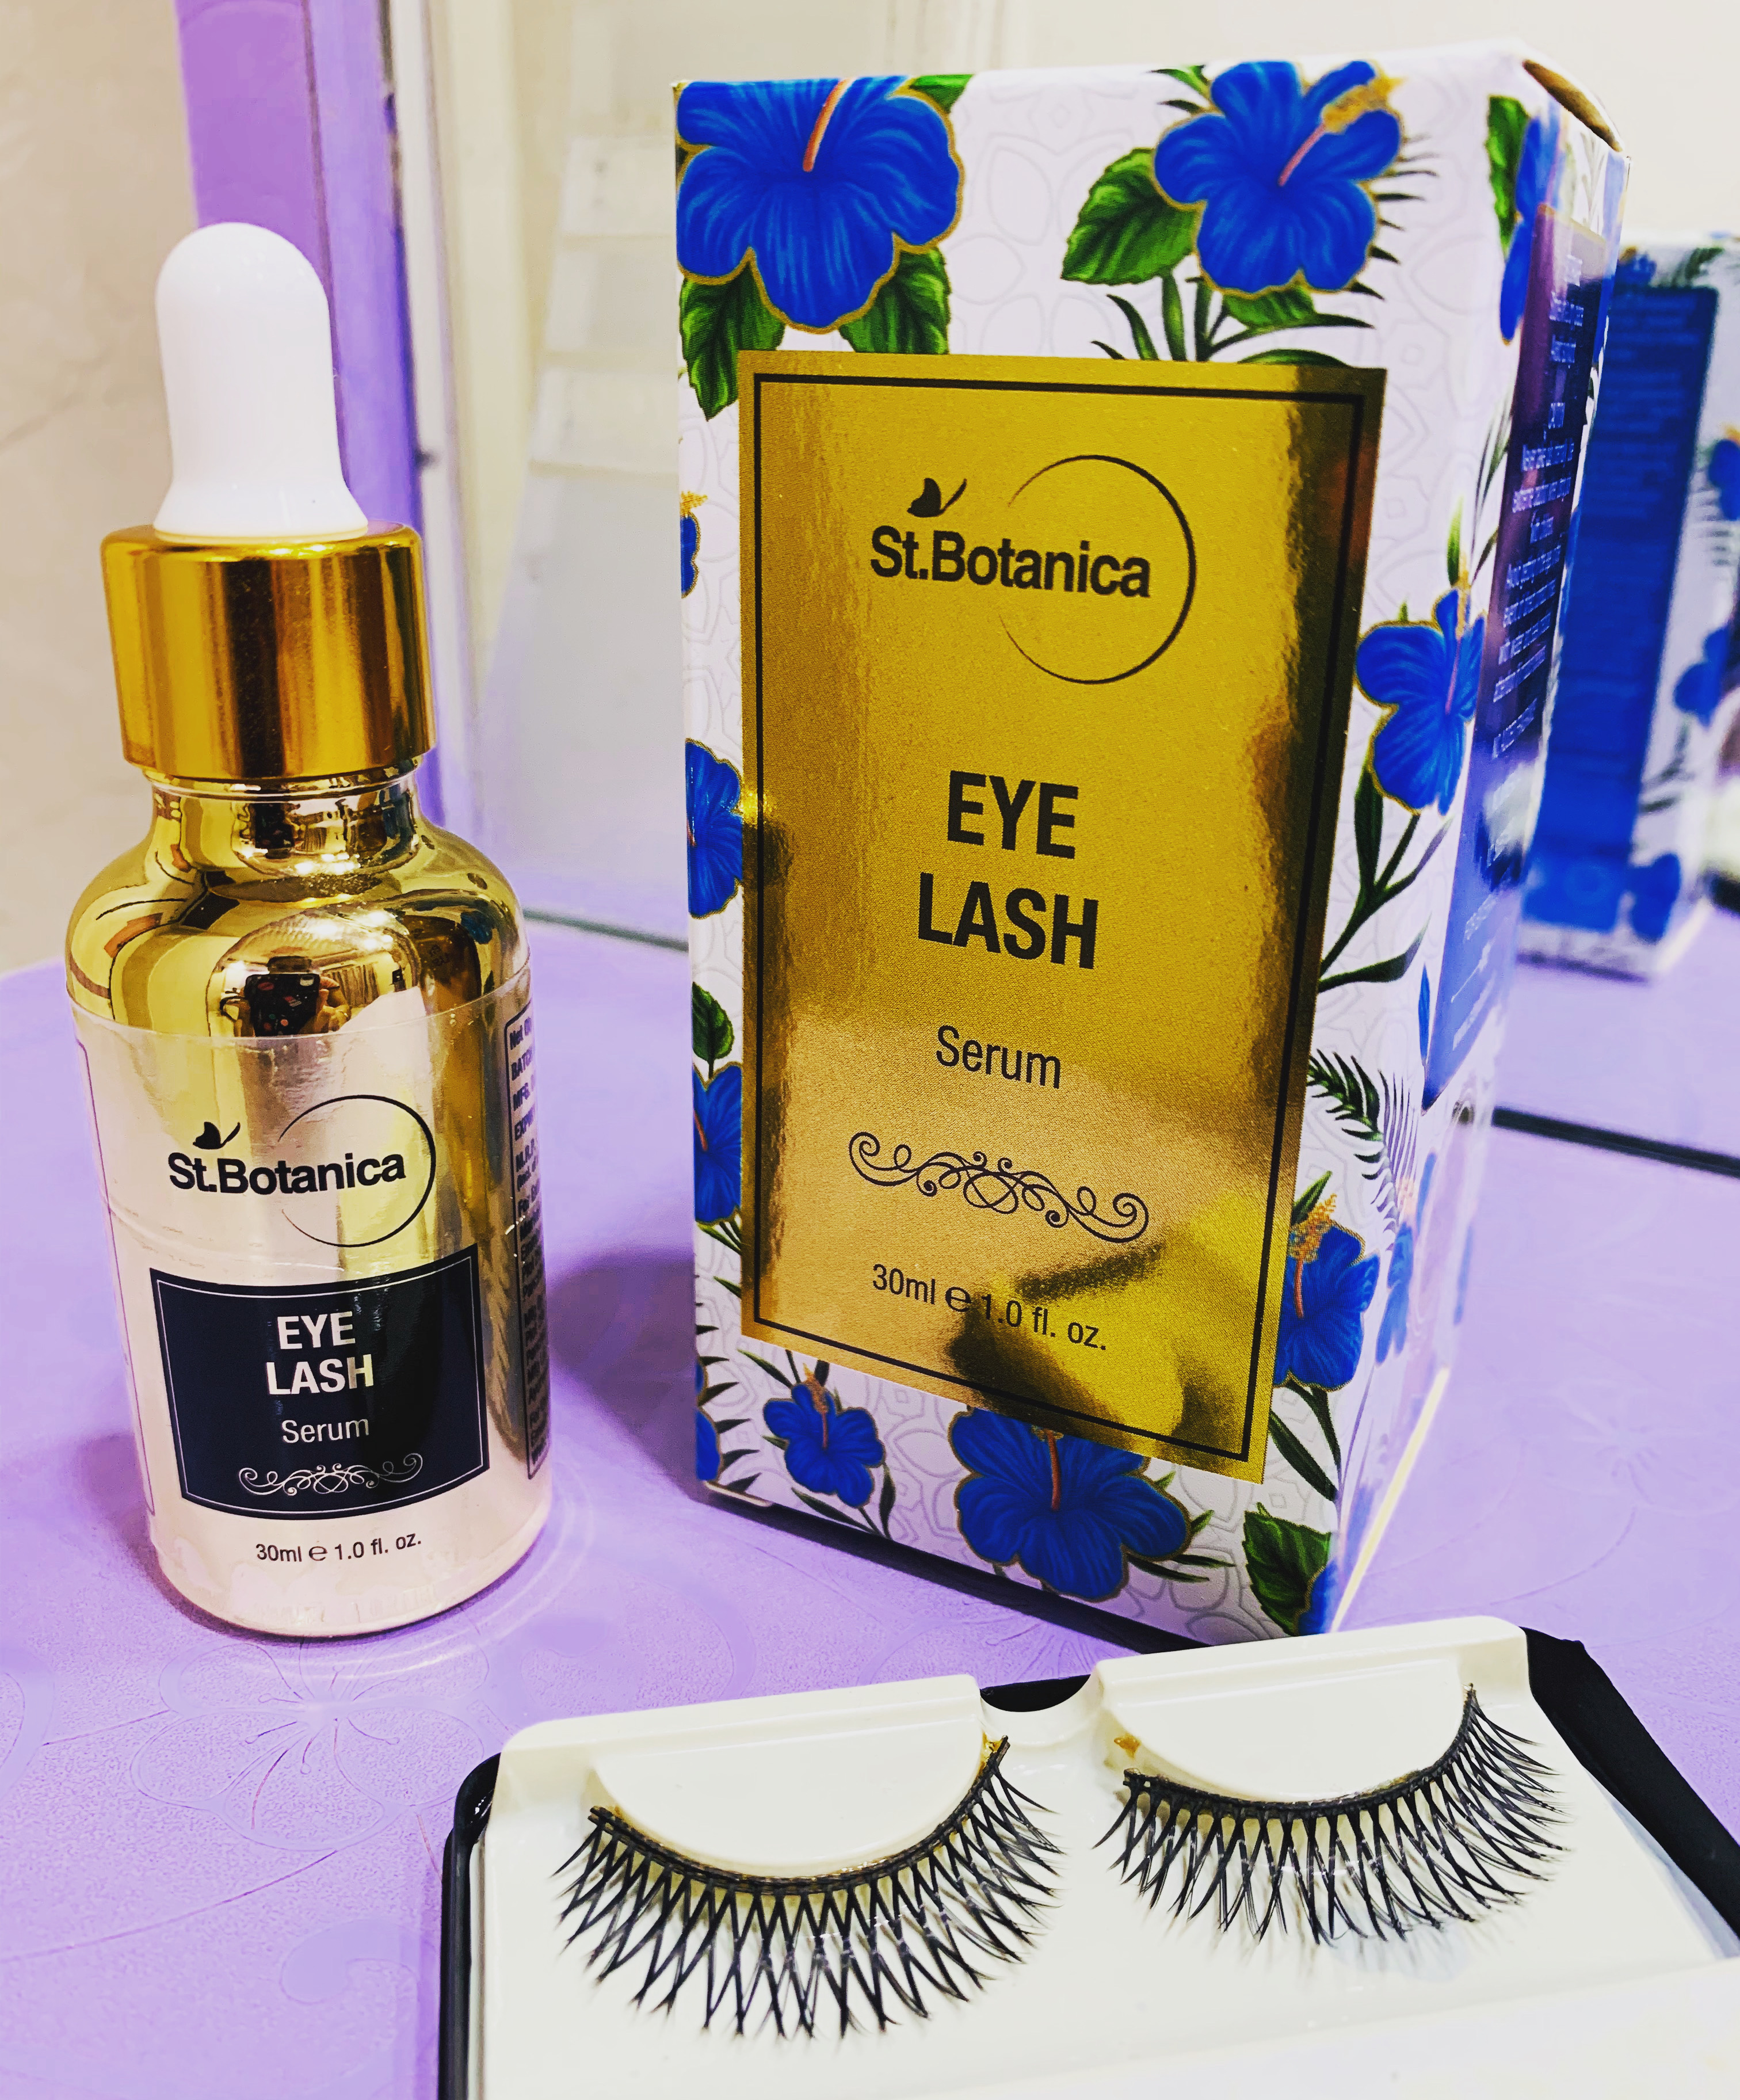 St.Botanica Eyelash Growth Serum-Works Like an Eyelash Primer!-By anmol_mulchandani